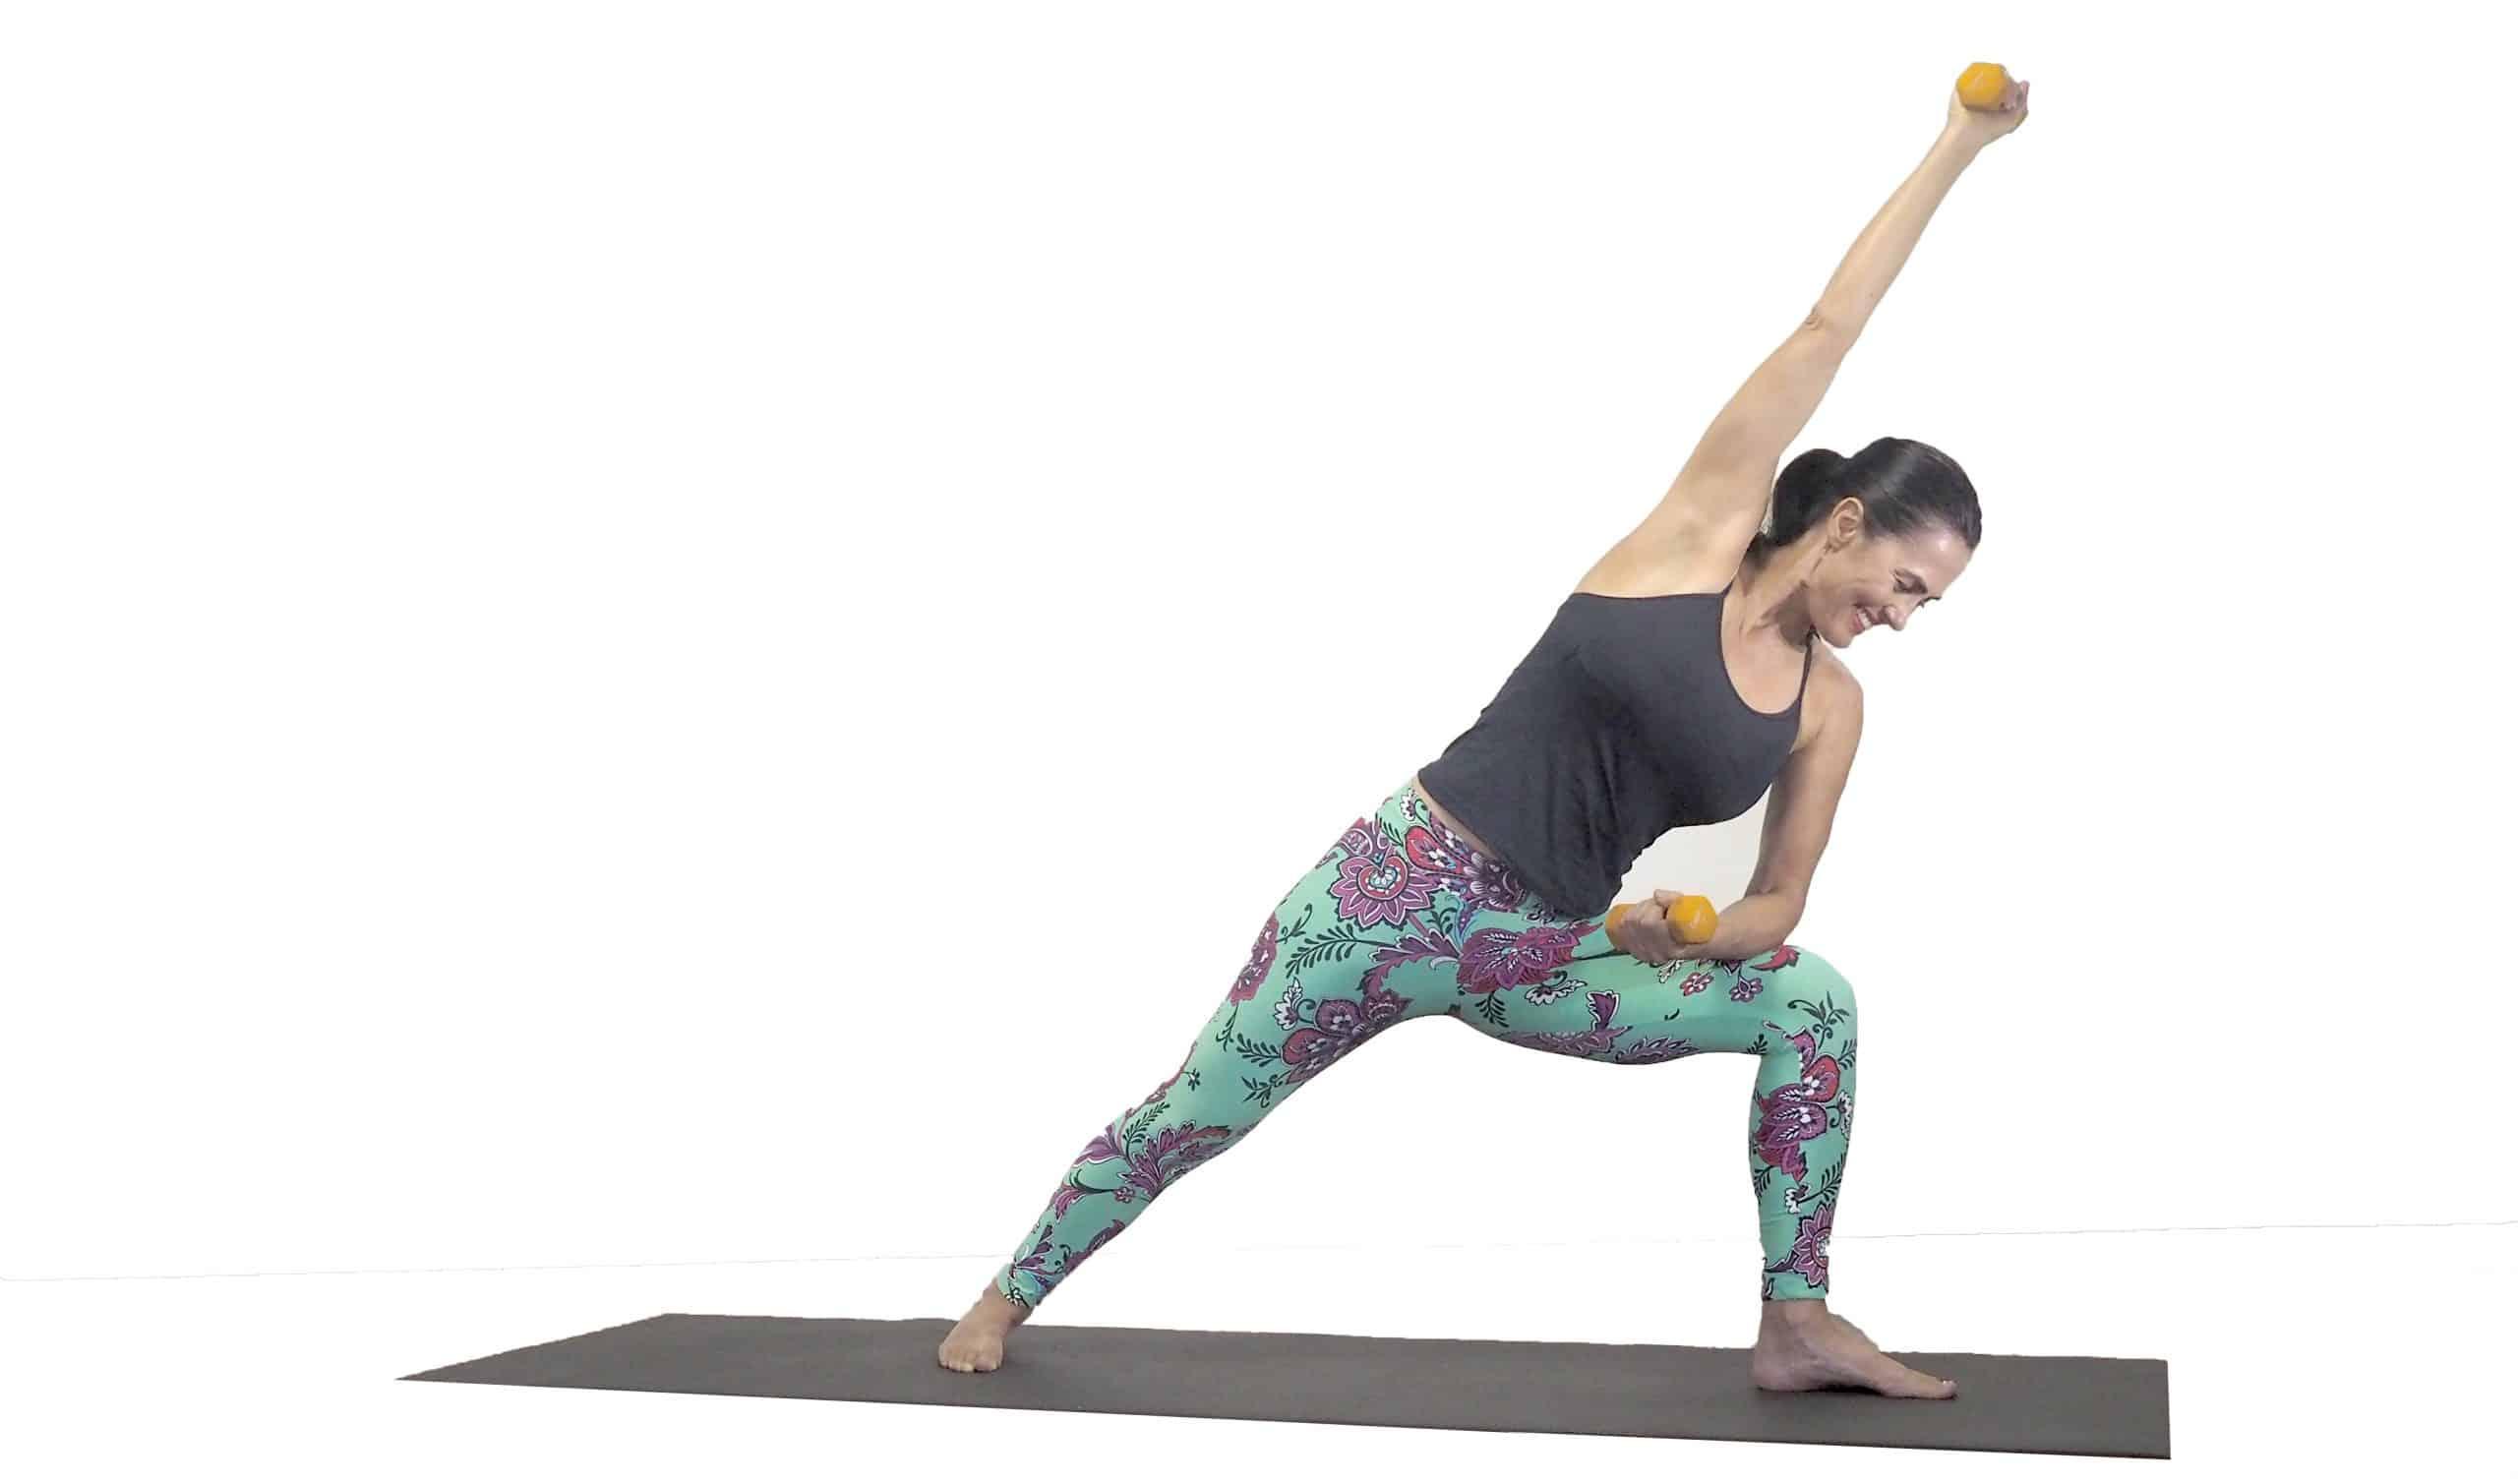 Pilates ball abs using dumbbells